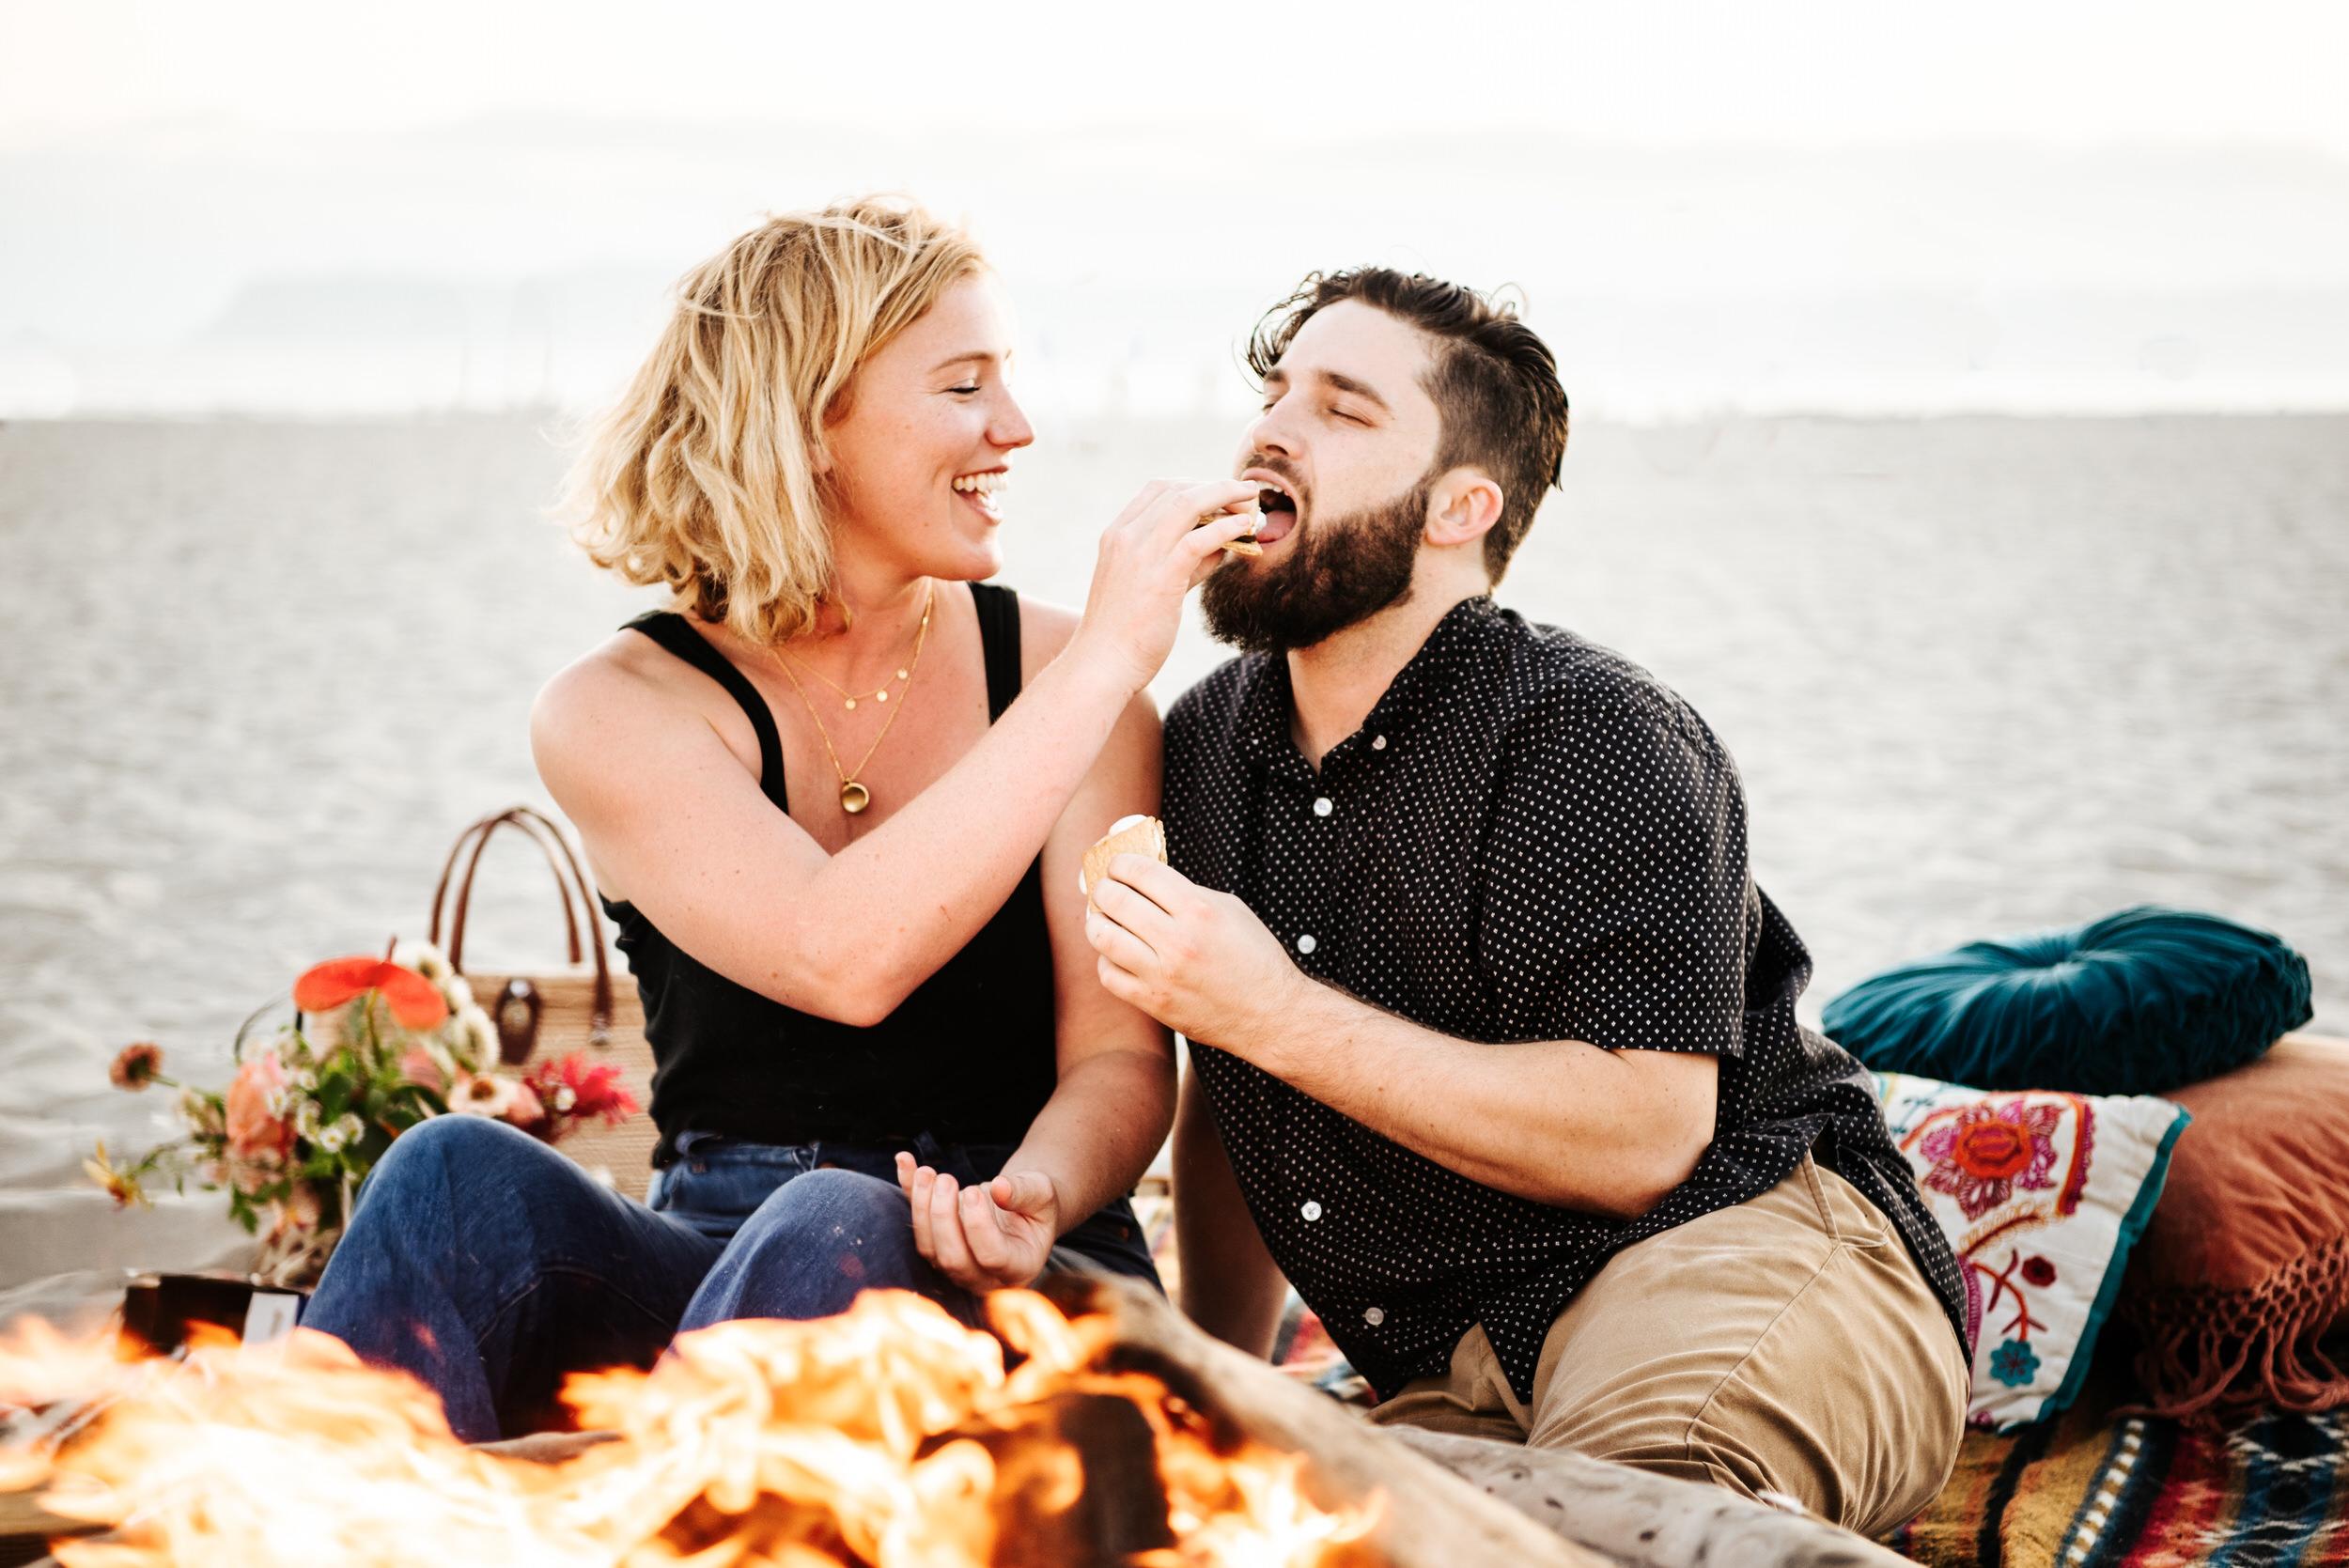 SoCal Standard - San Diego Engagement Photographer - Beach Bonfire at the Hotel Del Coronado-34.jpg